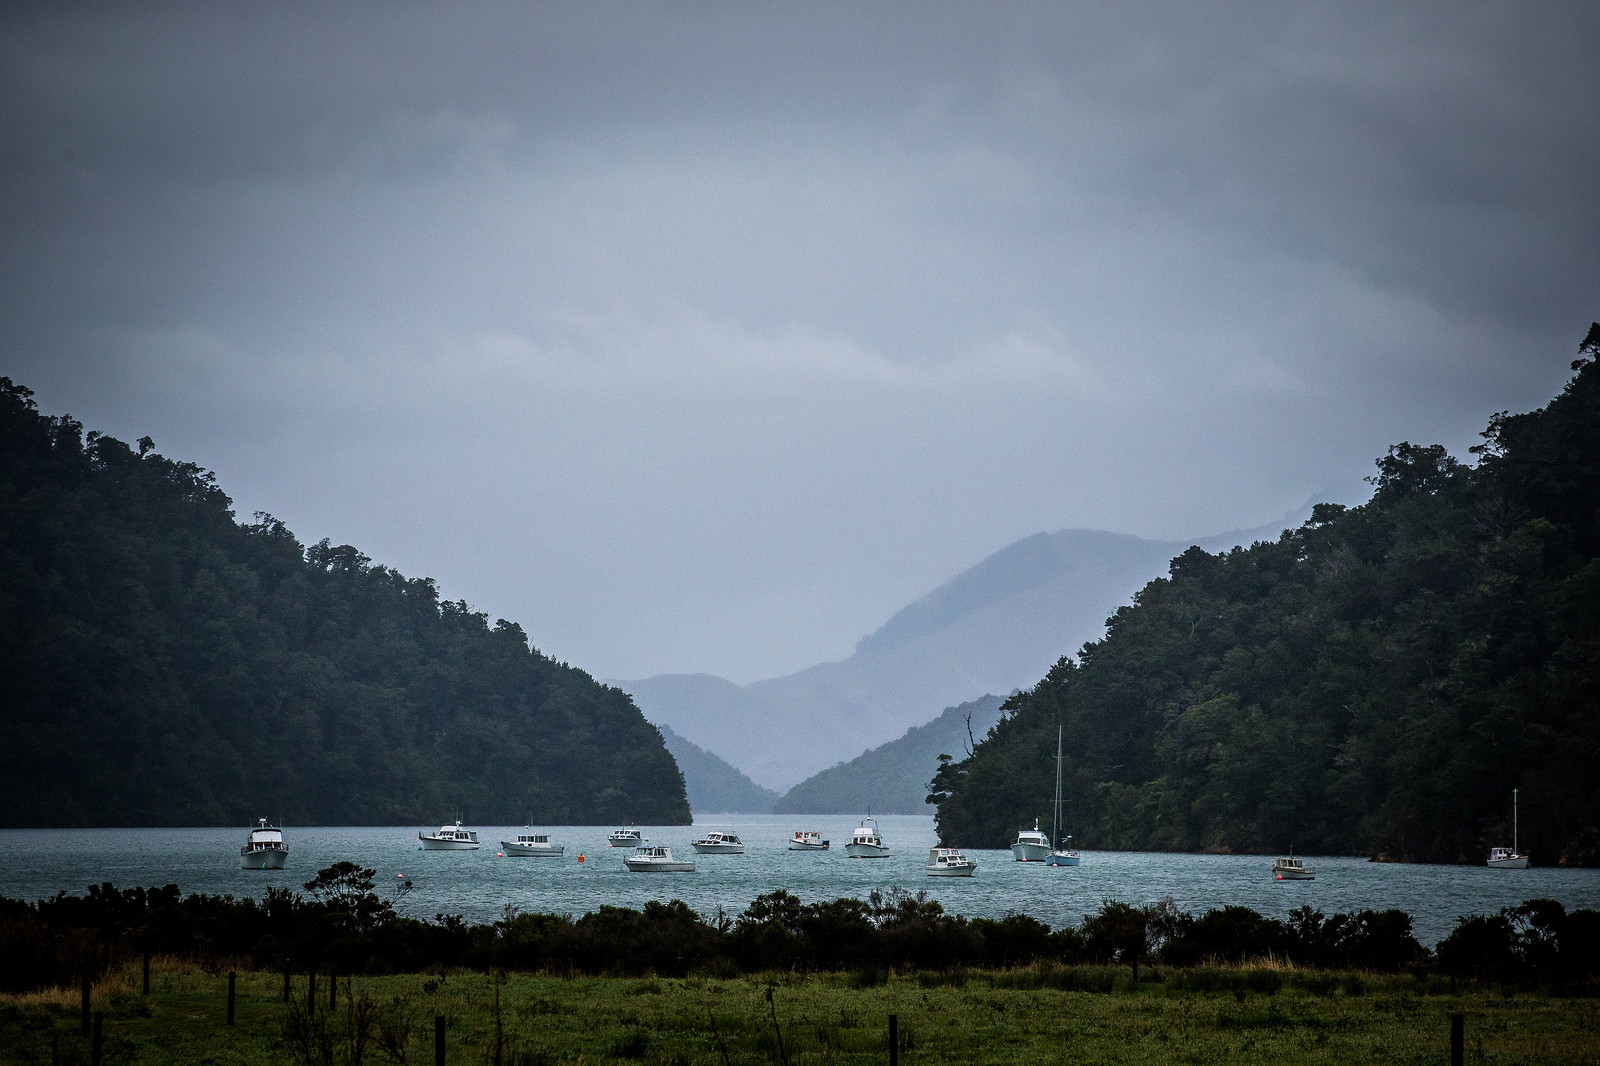 NZ Beauty - NZ Enduro Day 2 - Mountain Biking Pictures - Vital MTB